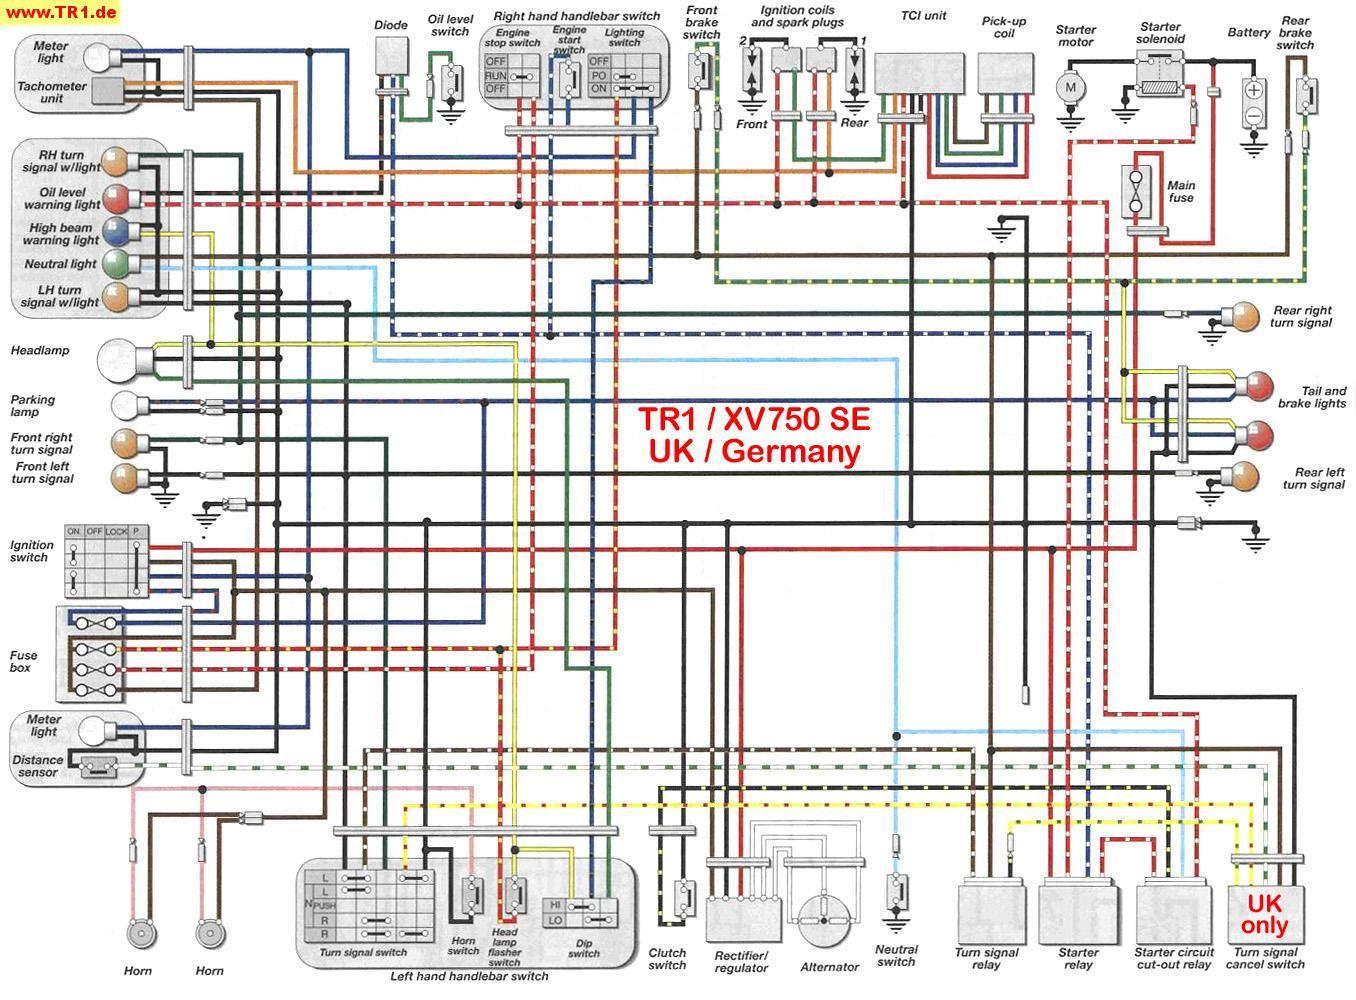 LX_8207] Yamaha Virago 920 Wiring Diagram 82 Virago Bobber Build Club  ChopperOnica Alypt Benol Wigeg Mohammedshrine Librar Wiring 101